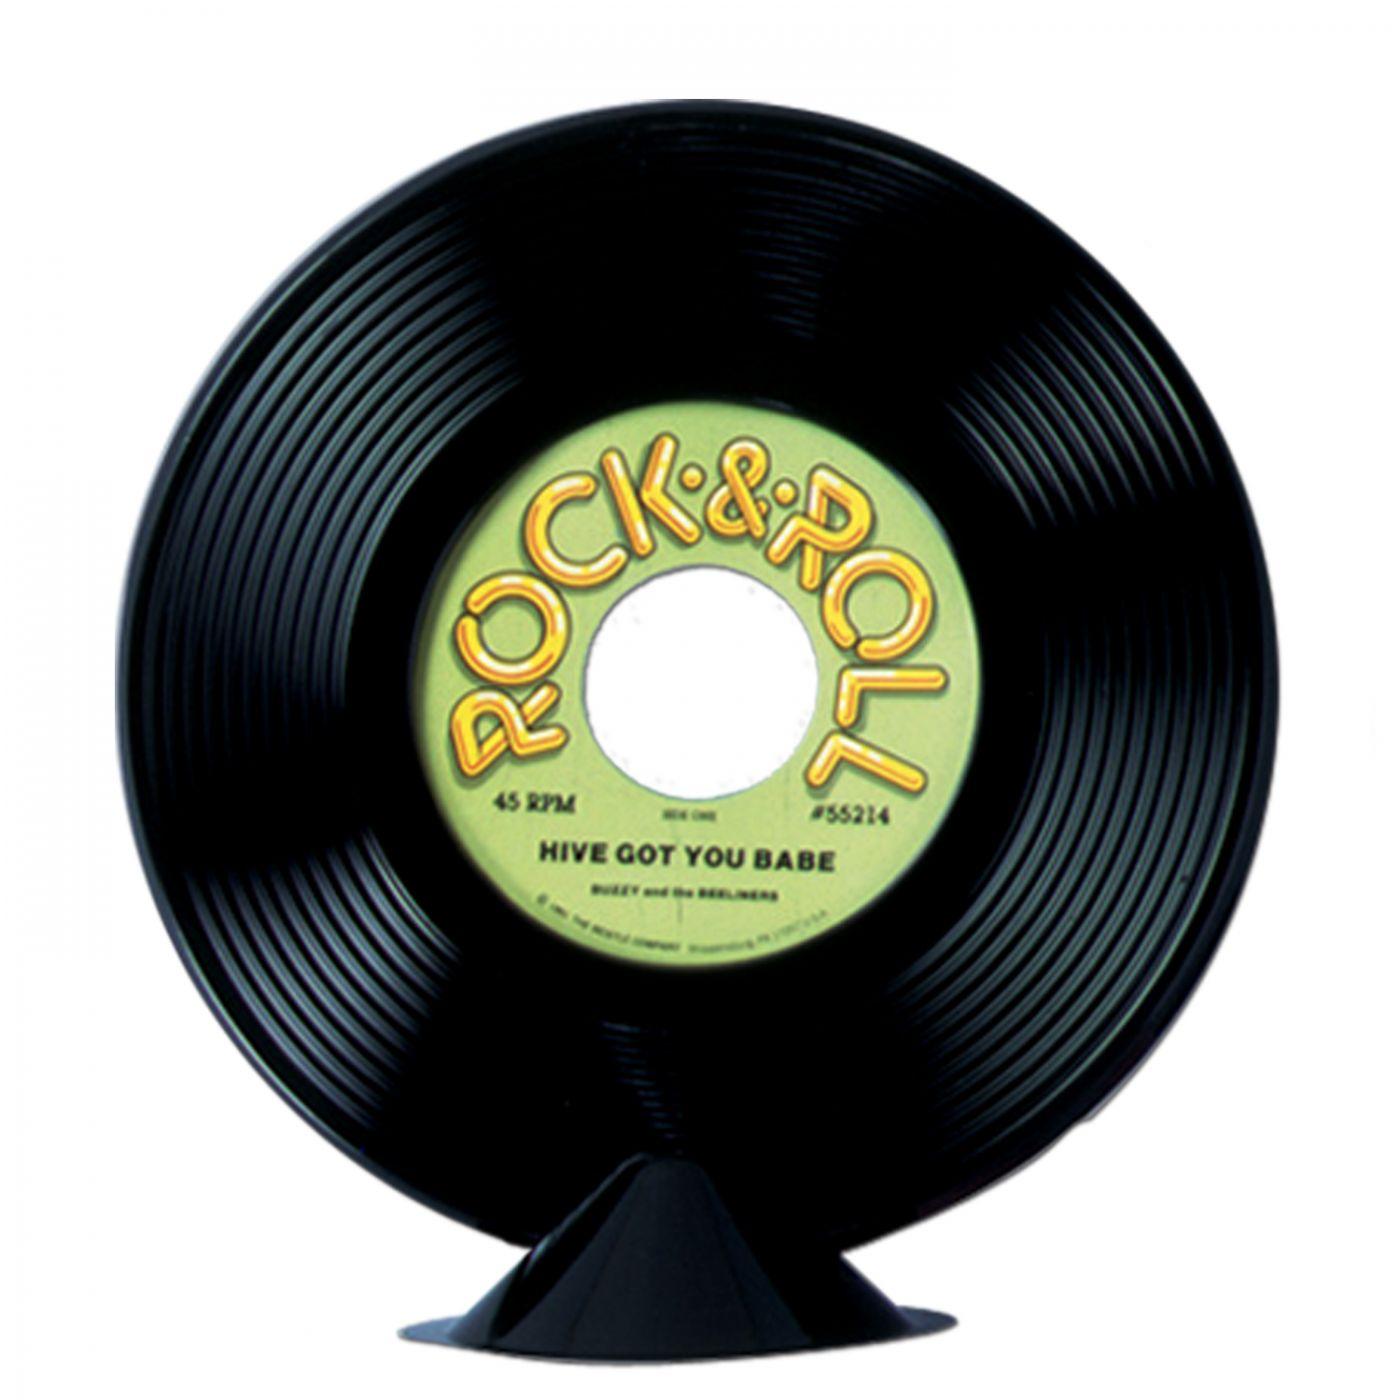 Plastic Record Centerpiece image